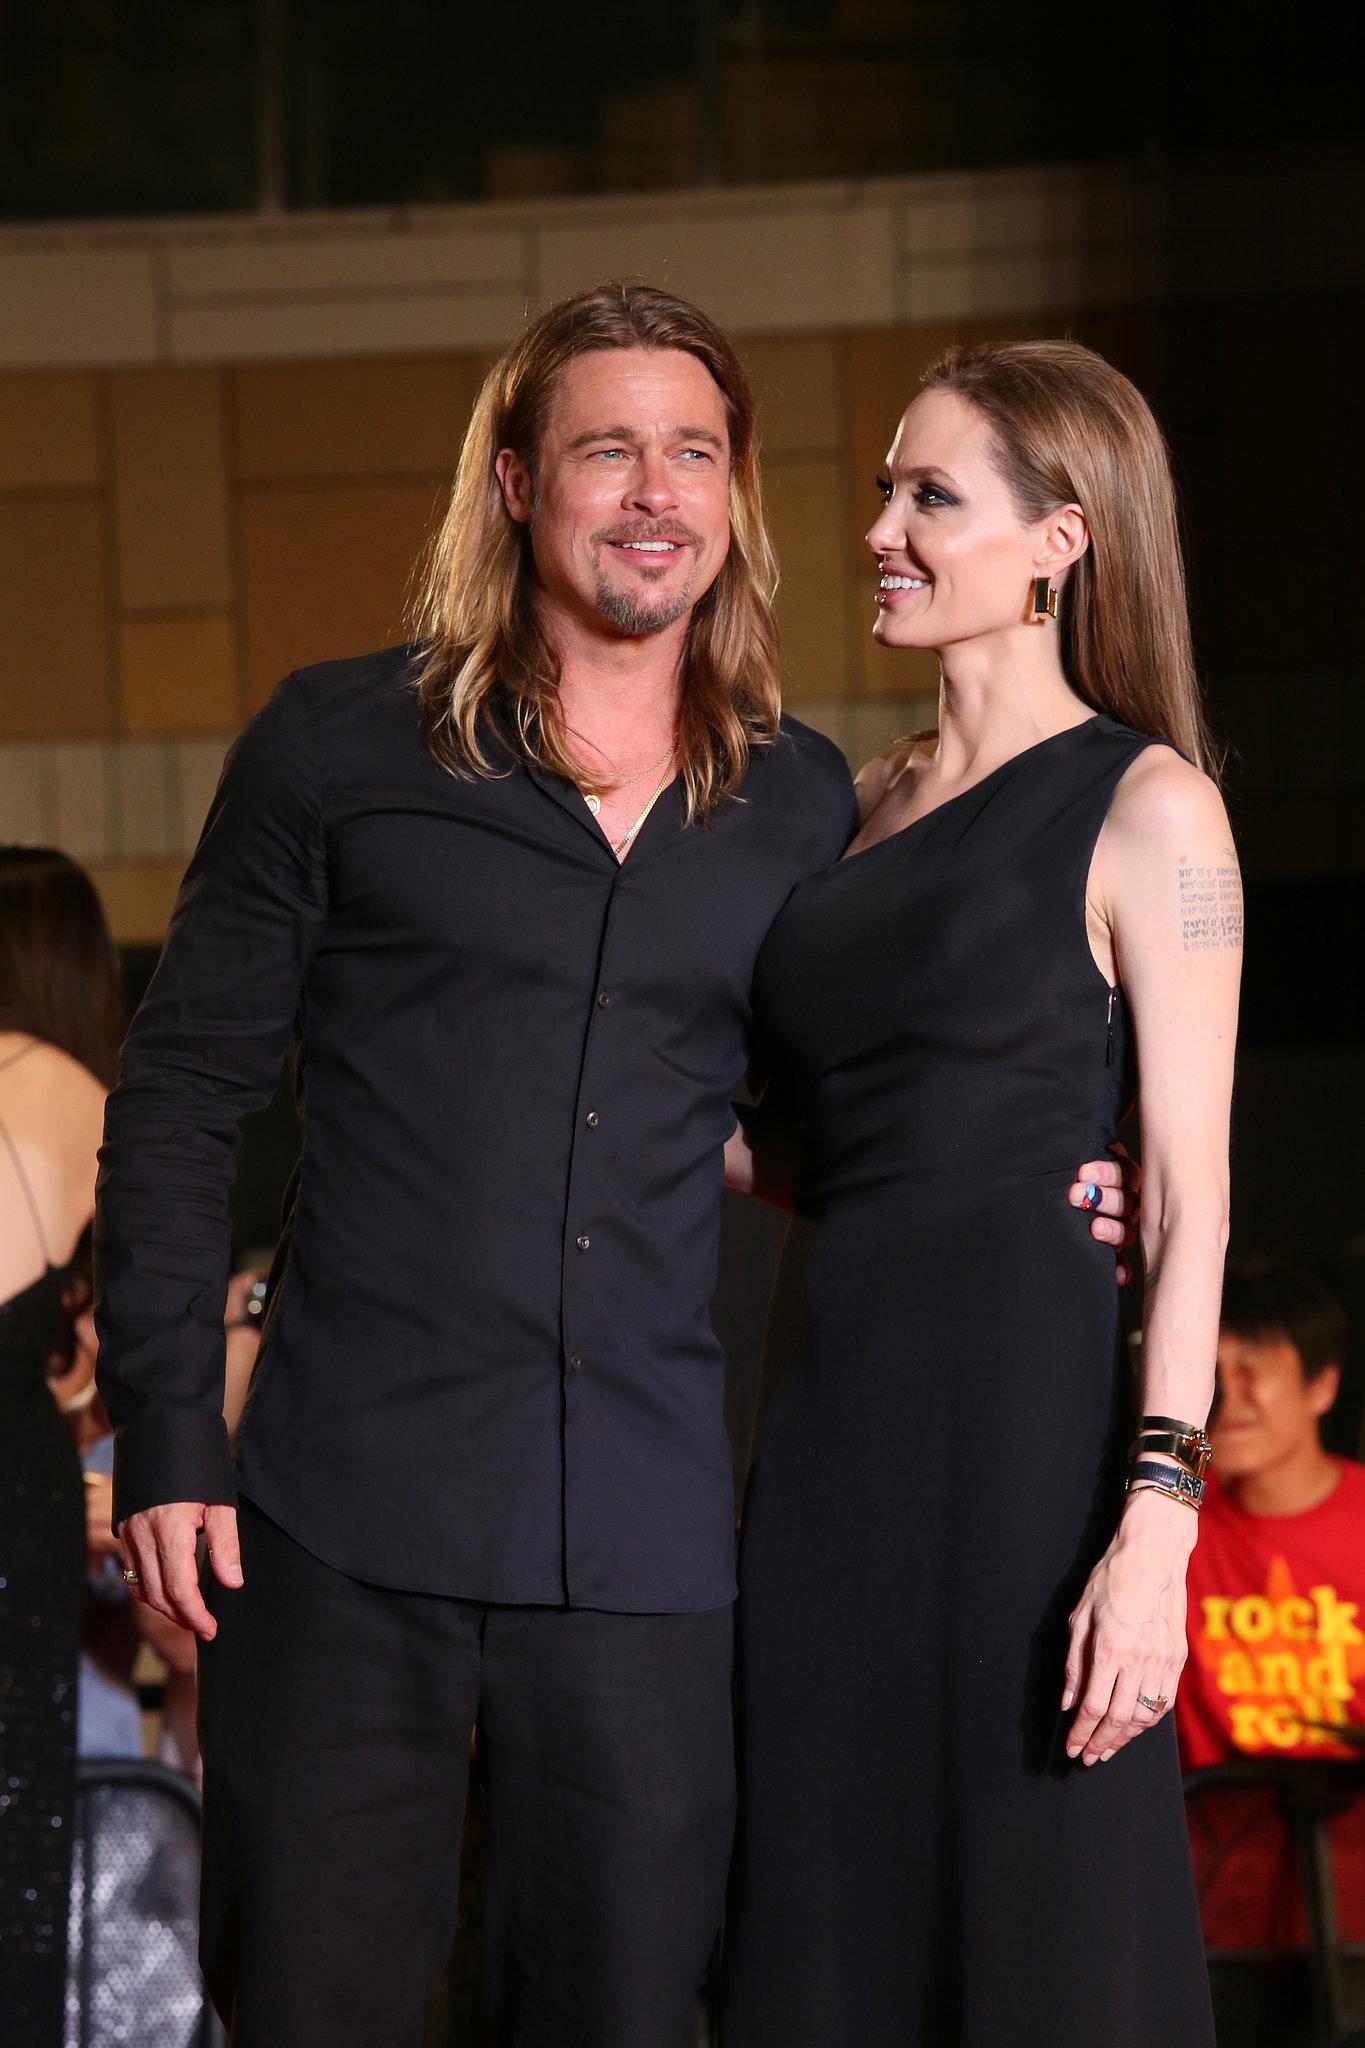 Angelina Jolie smiled at Brad Pitt.